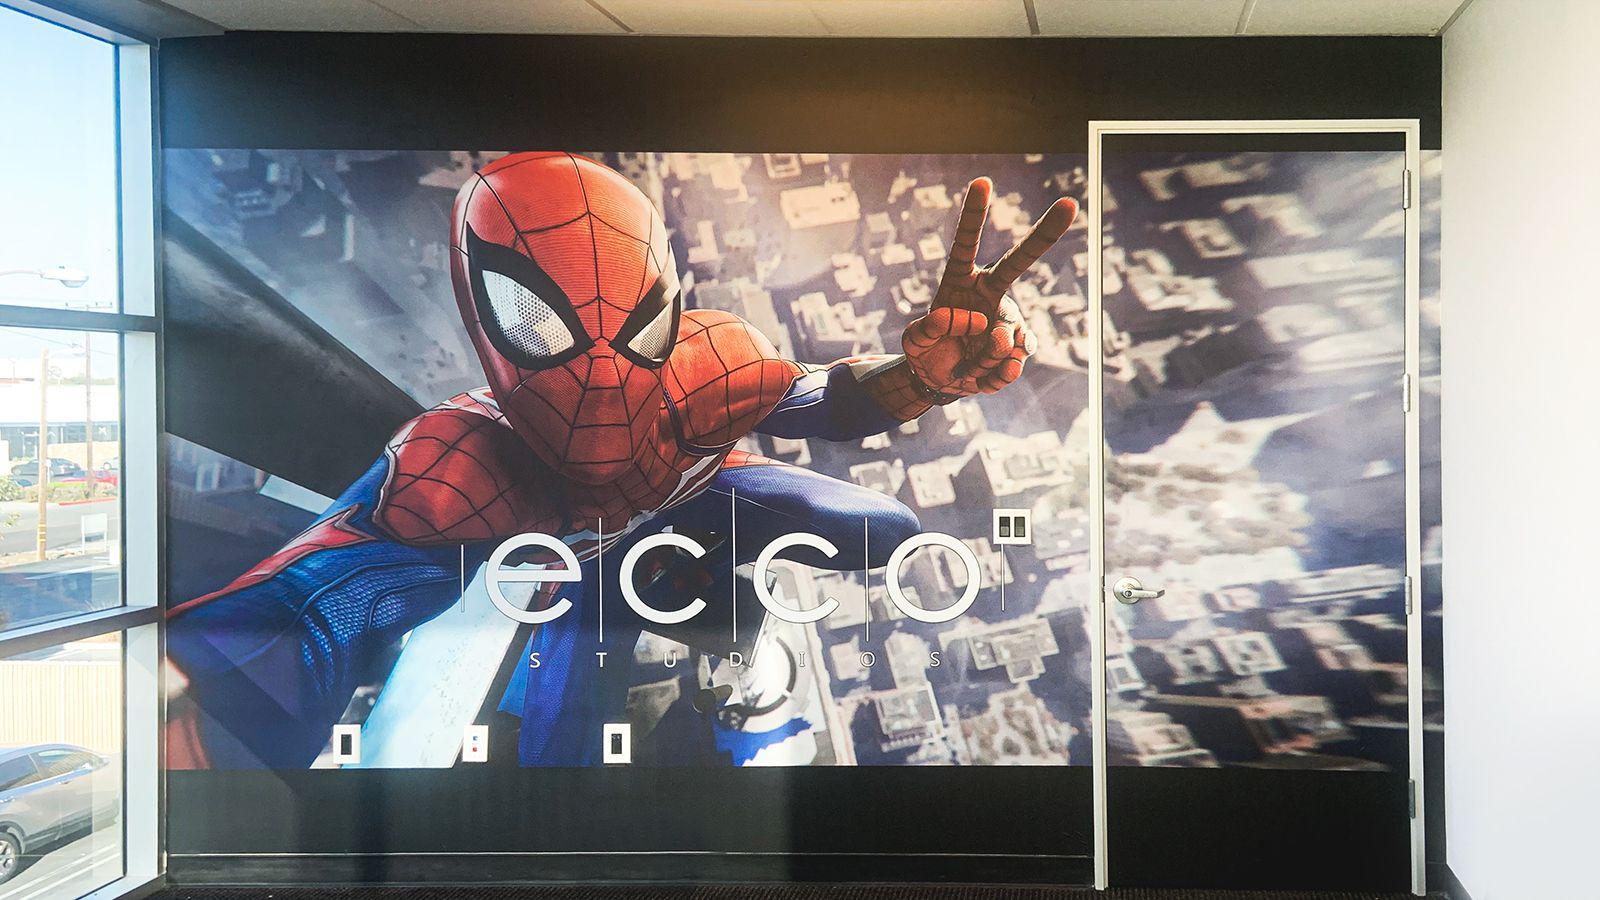 Ecco Studios wall decal